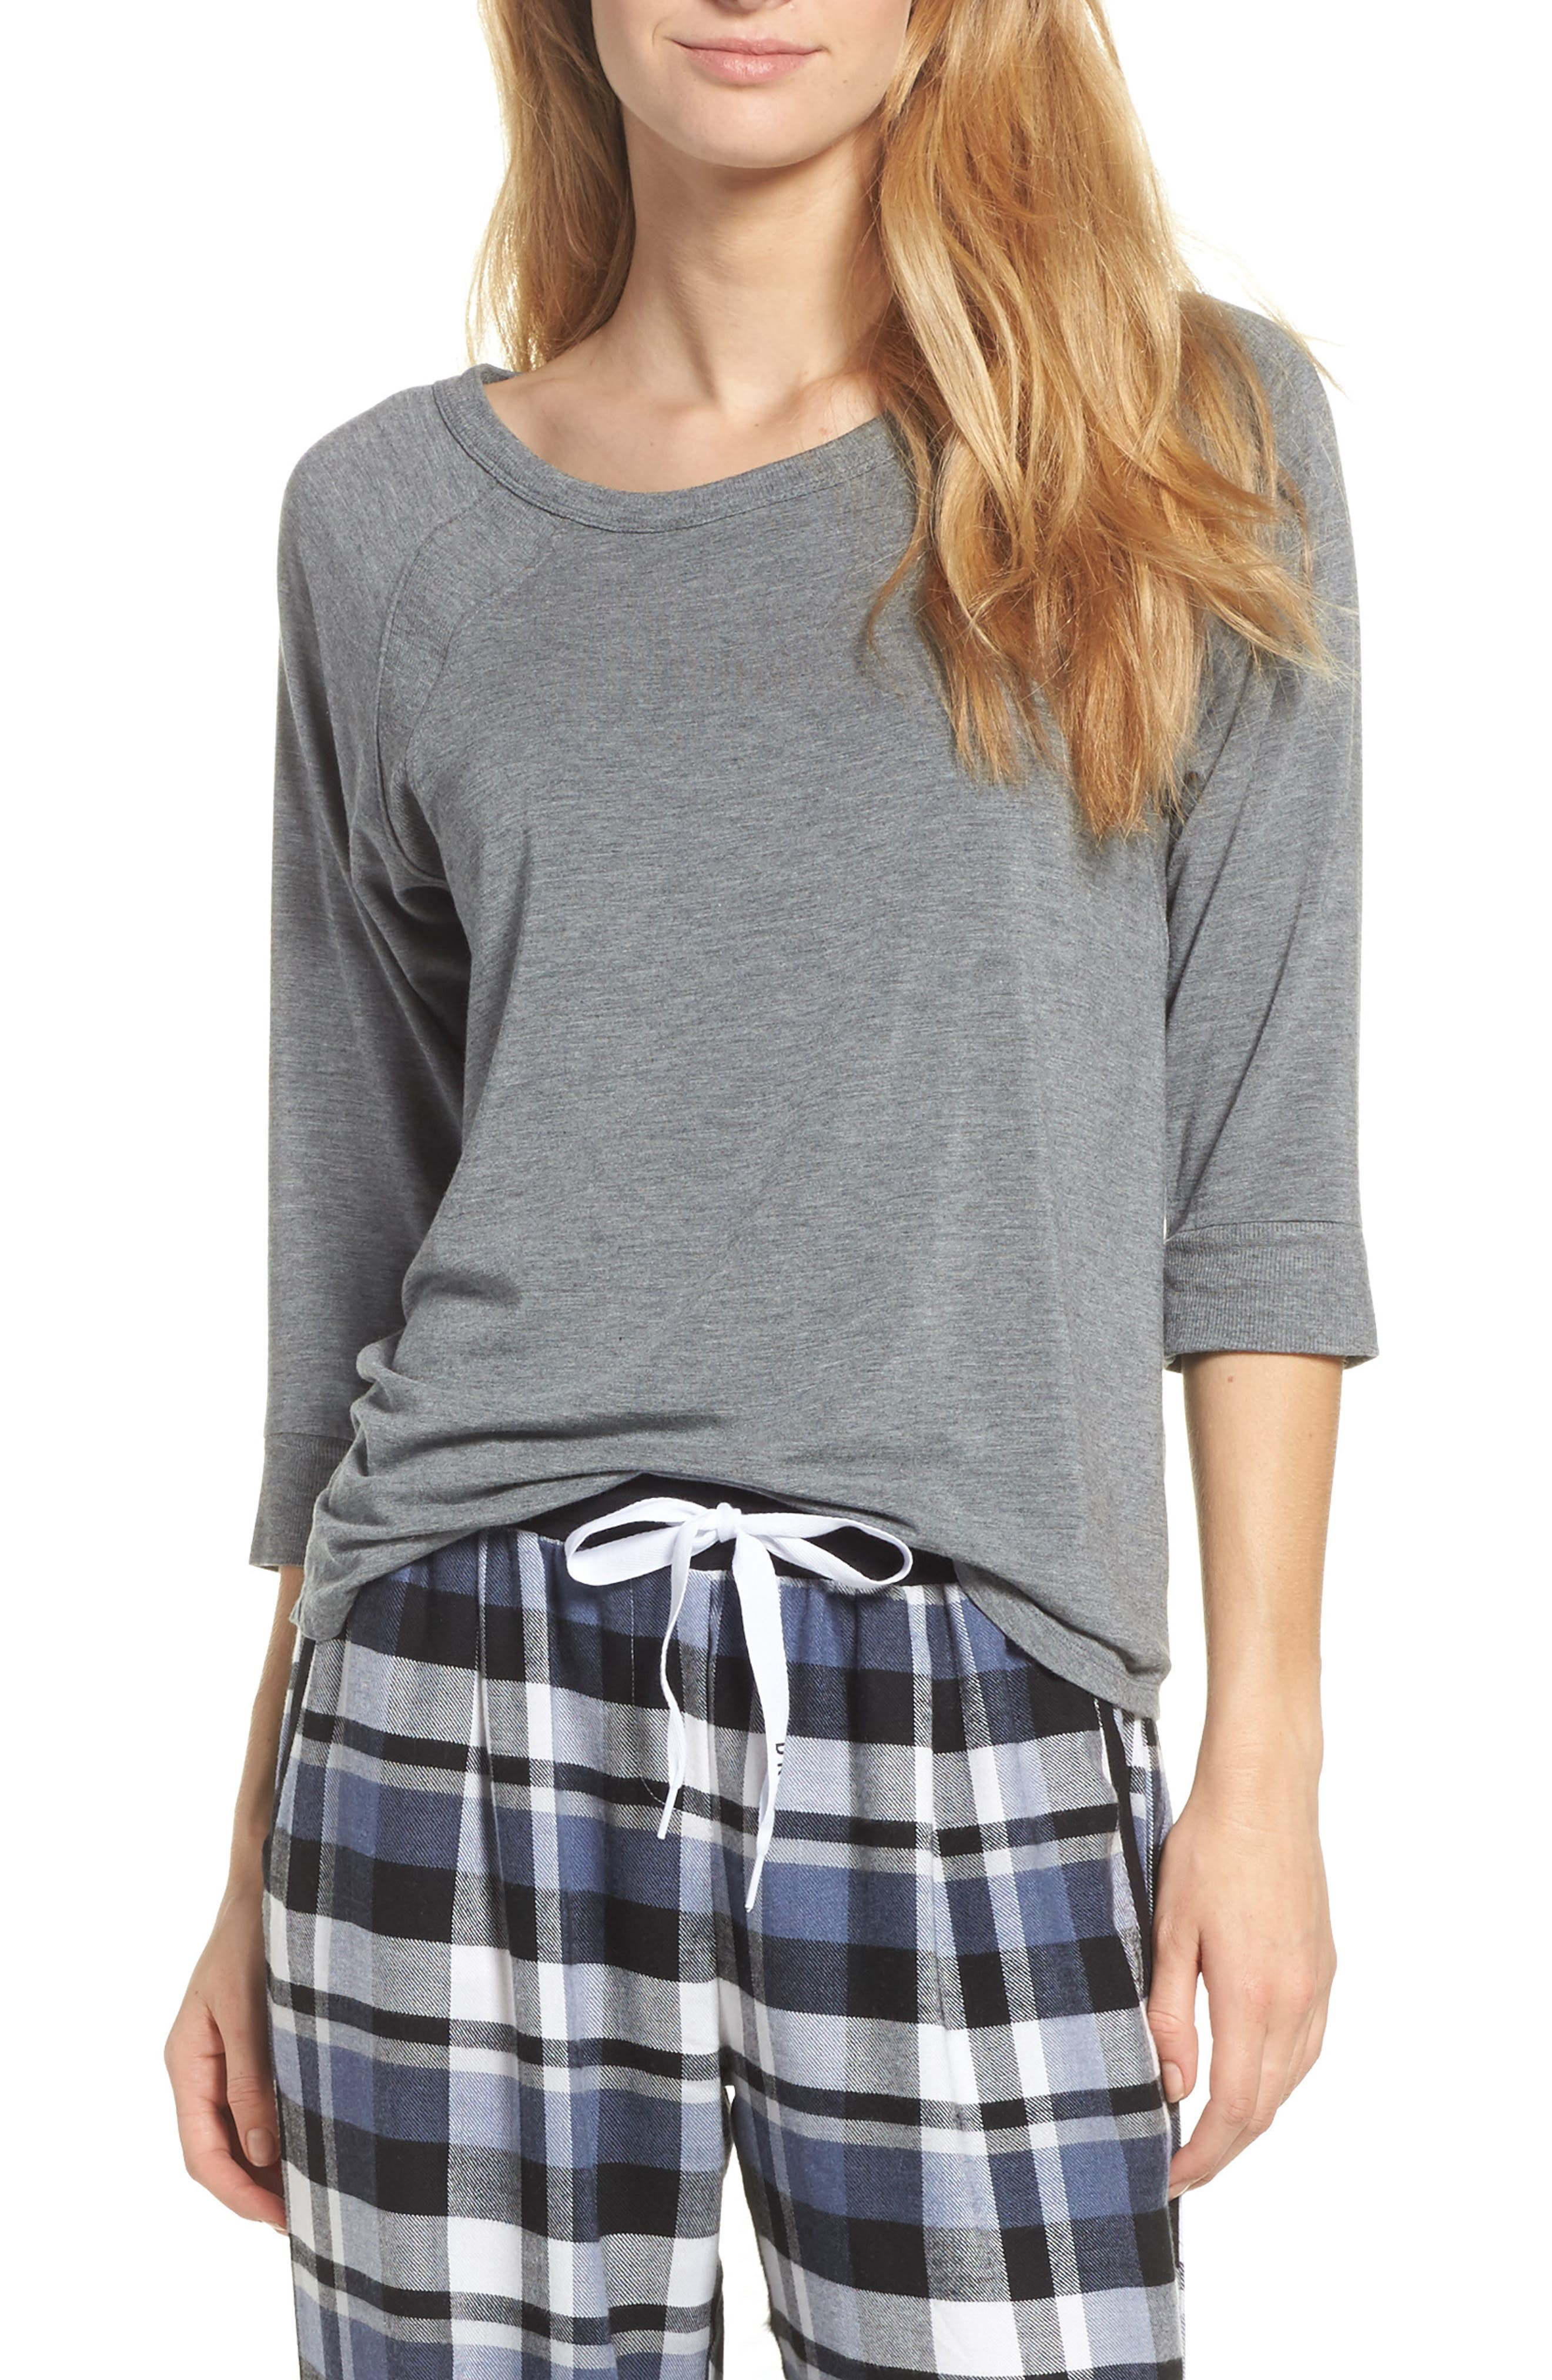 DKNY Three Quarter Sleeve Top